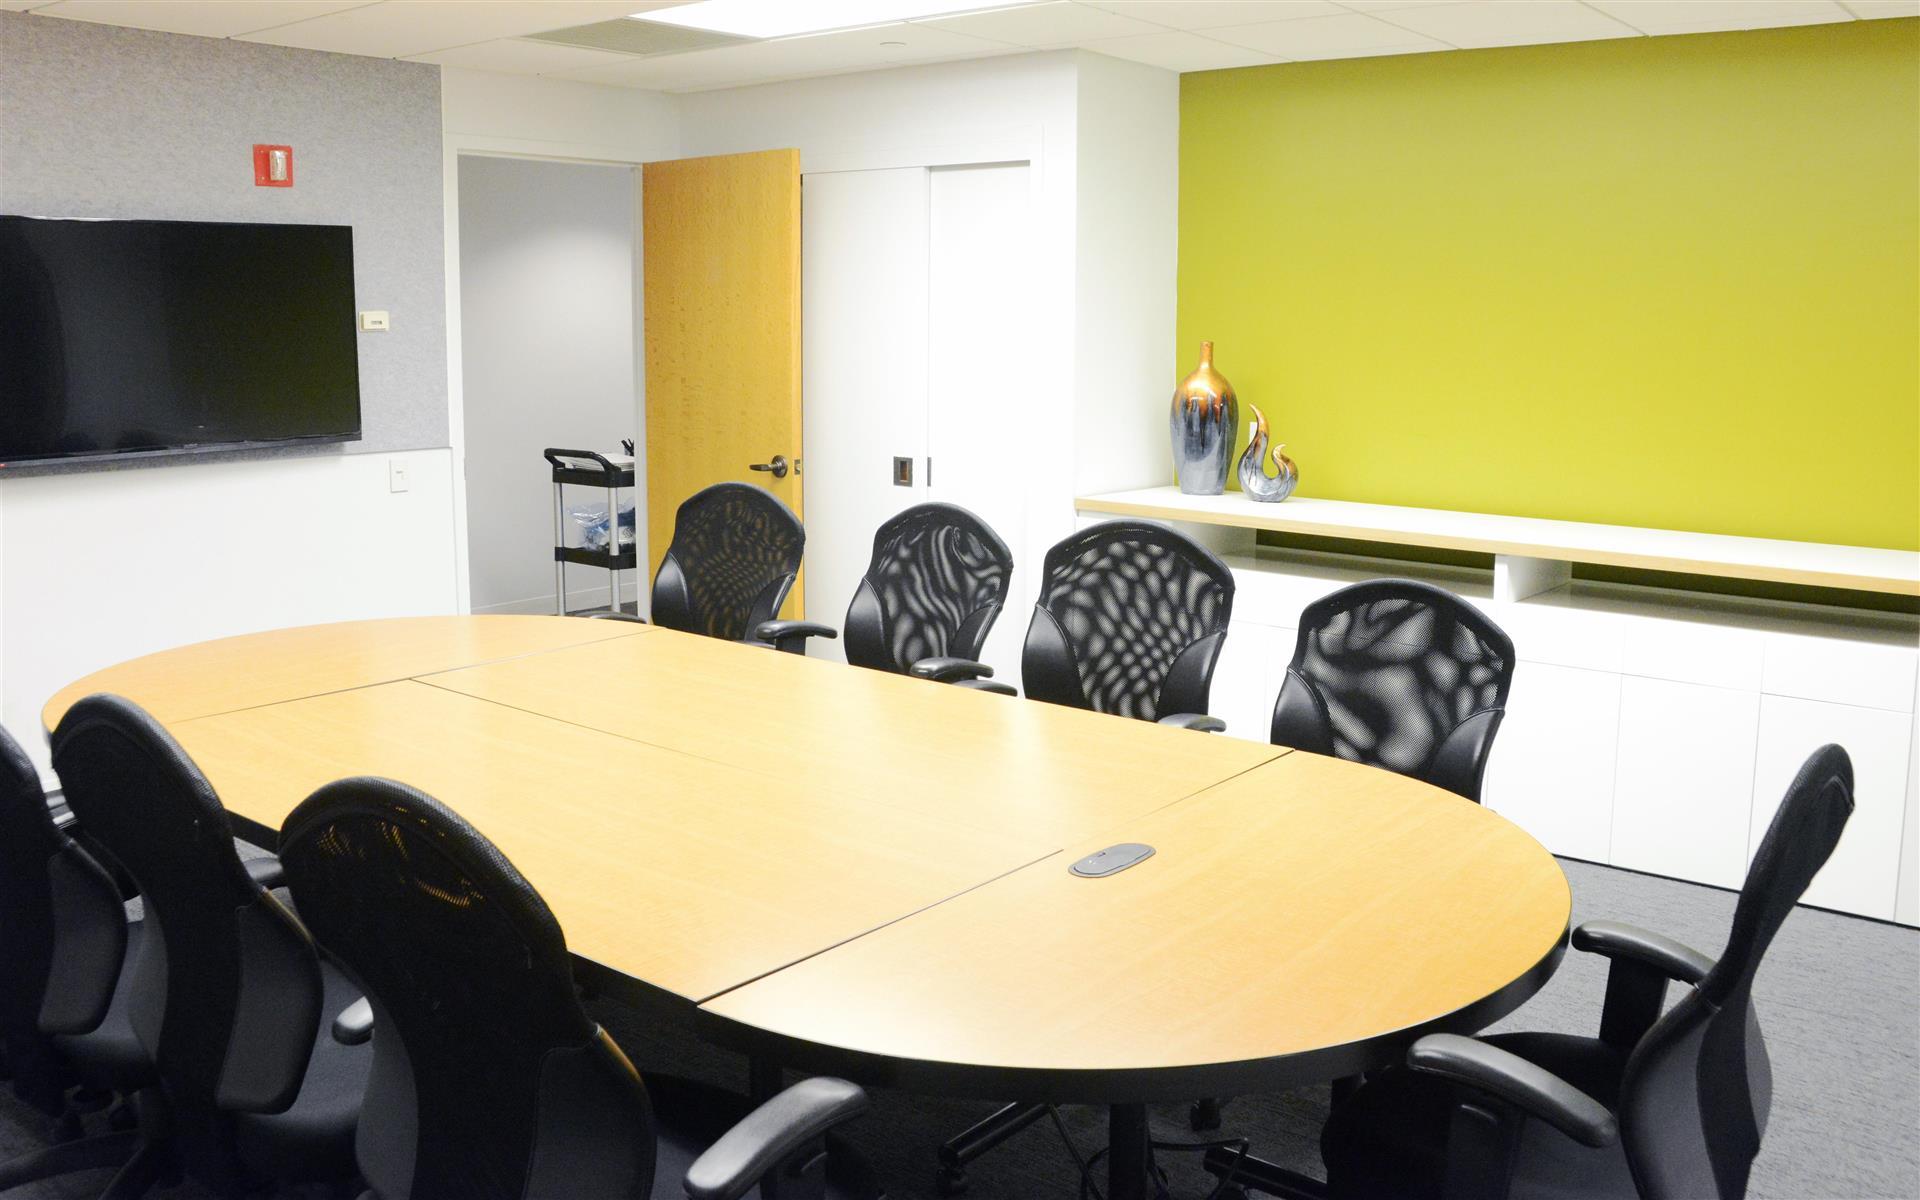 Focus Suites of Philadelphia - Green Room Suite